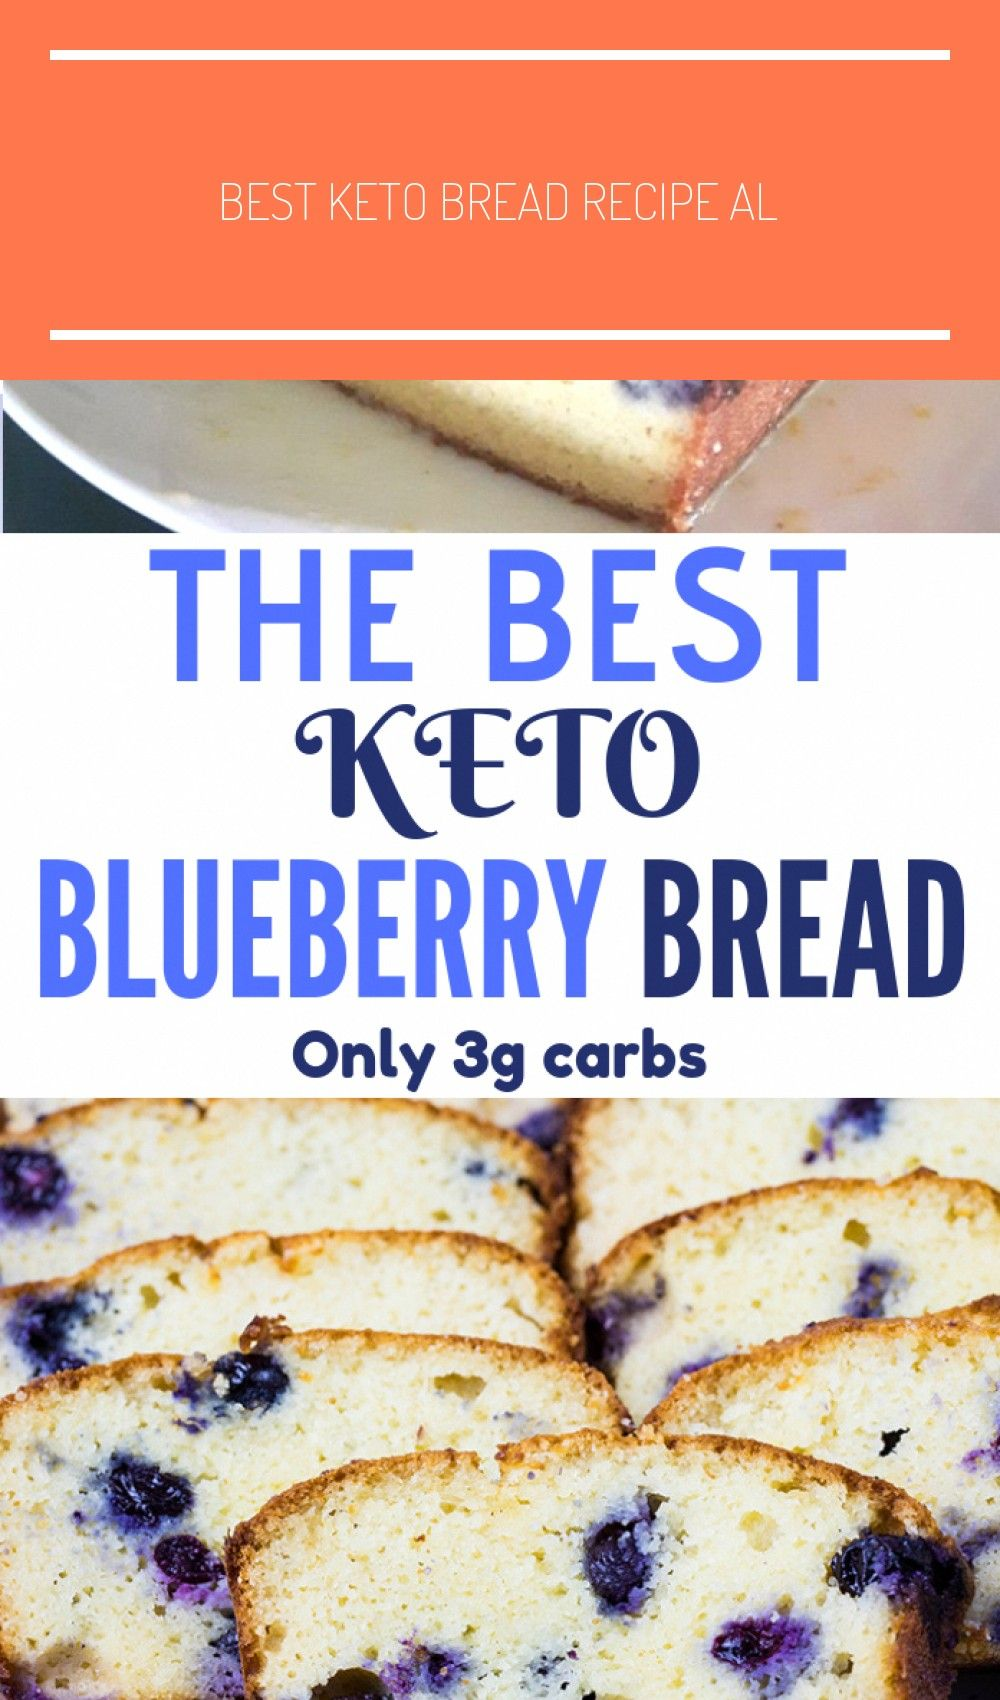 Best Keto Bread Recipe Almond Flour #KetoBreadRecipe #dieta cetogenica recetas postres